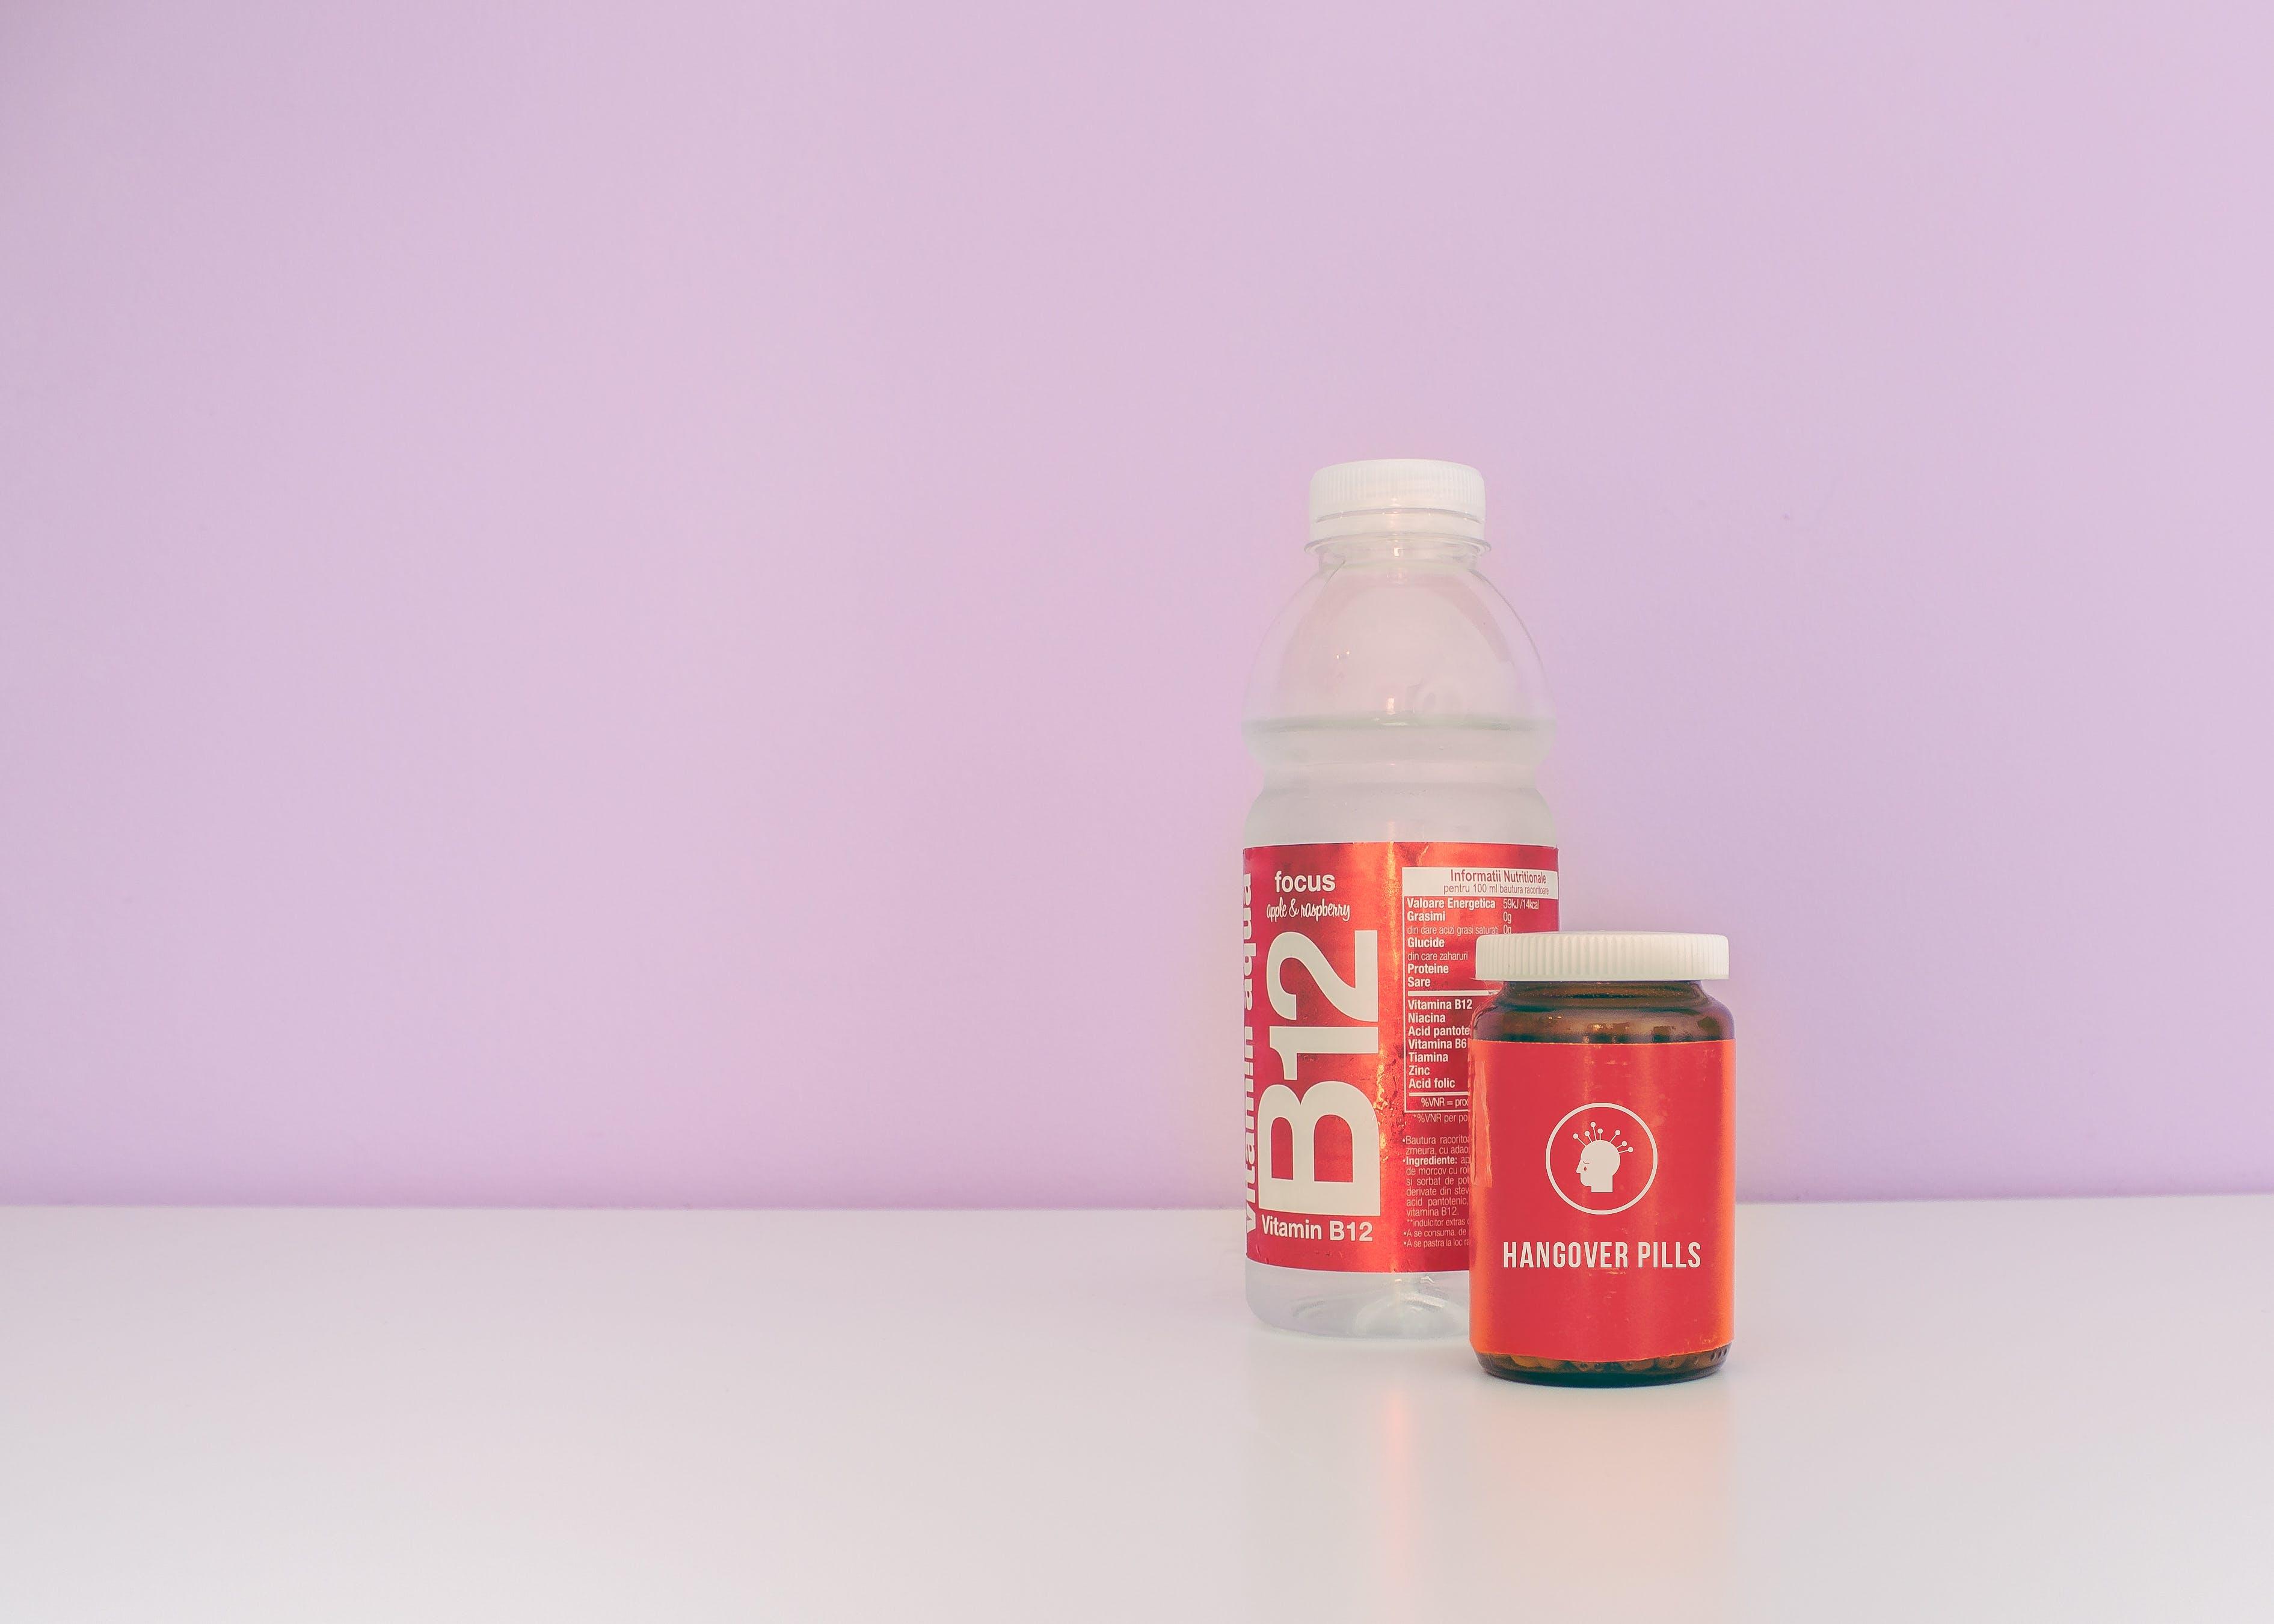 Free stock photo of water, hangover, bottle, pills